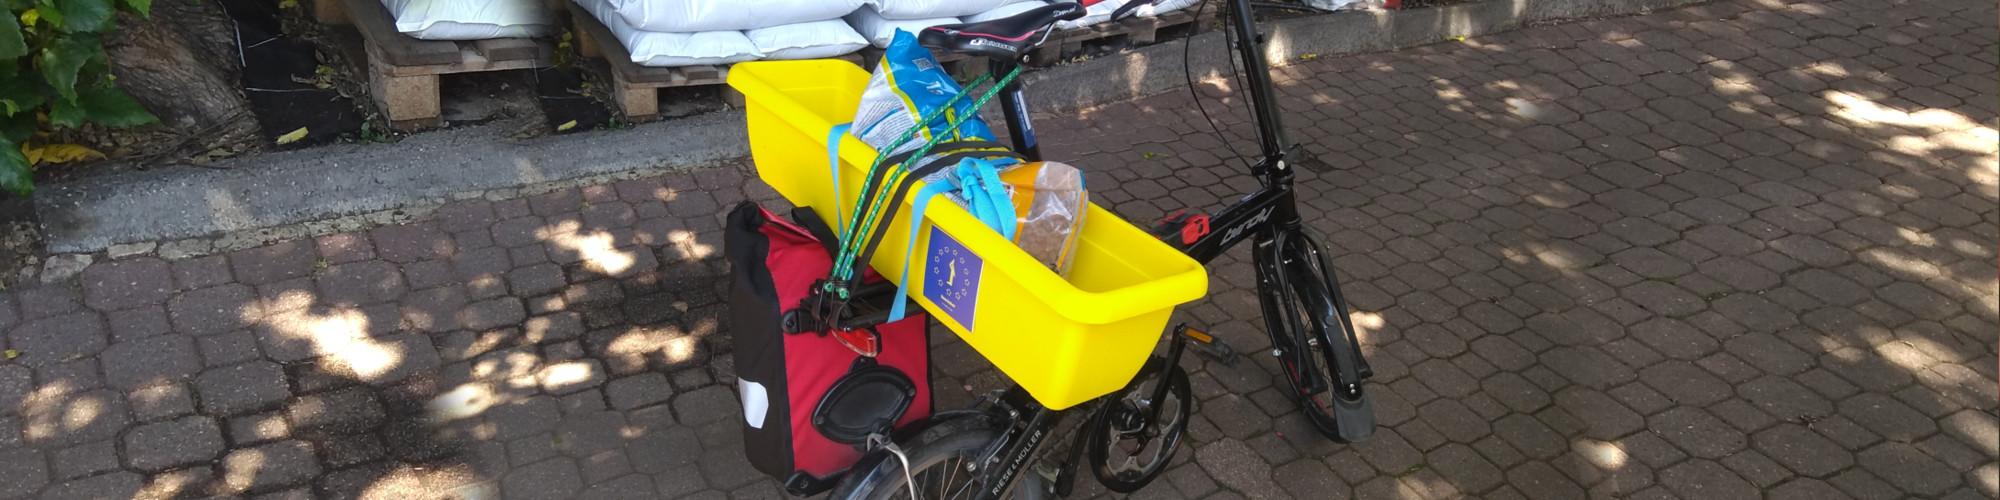 Beedabei-Fahrrad-Abholung